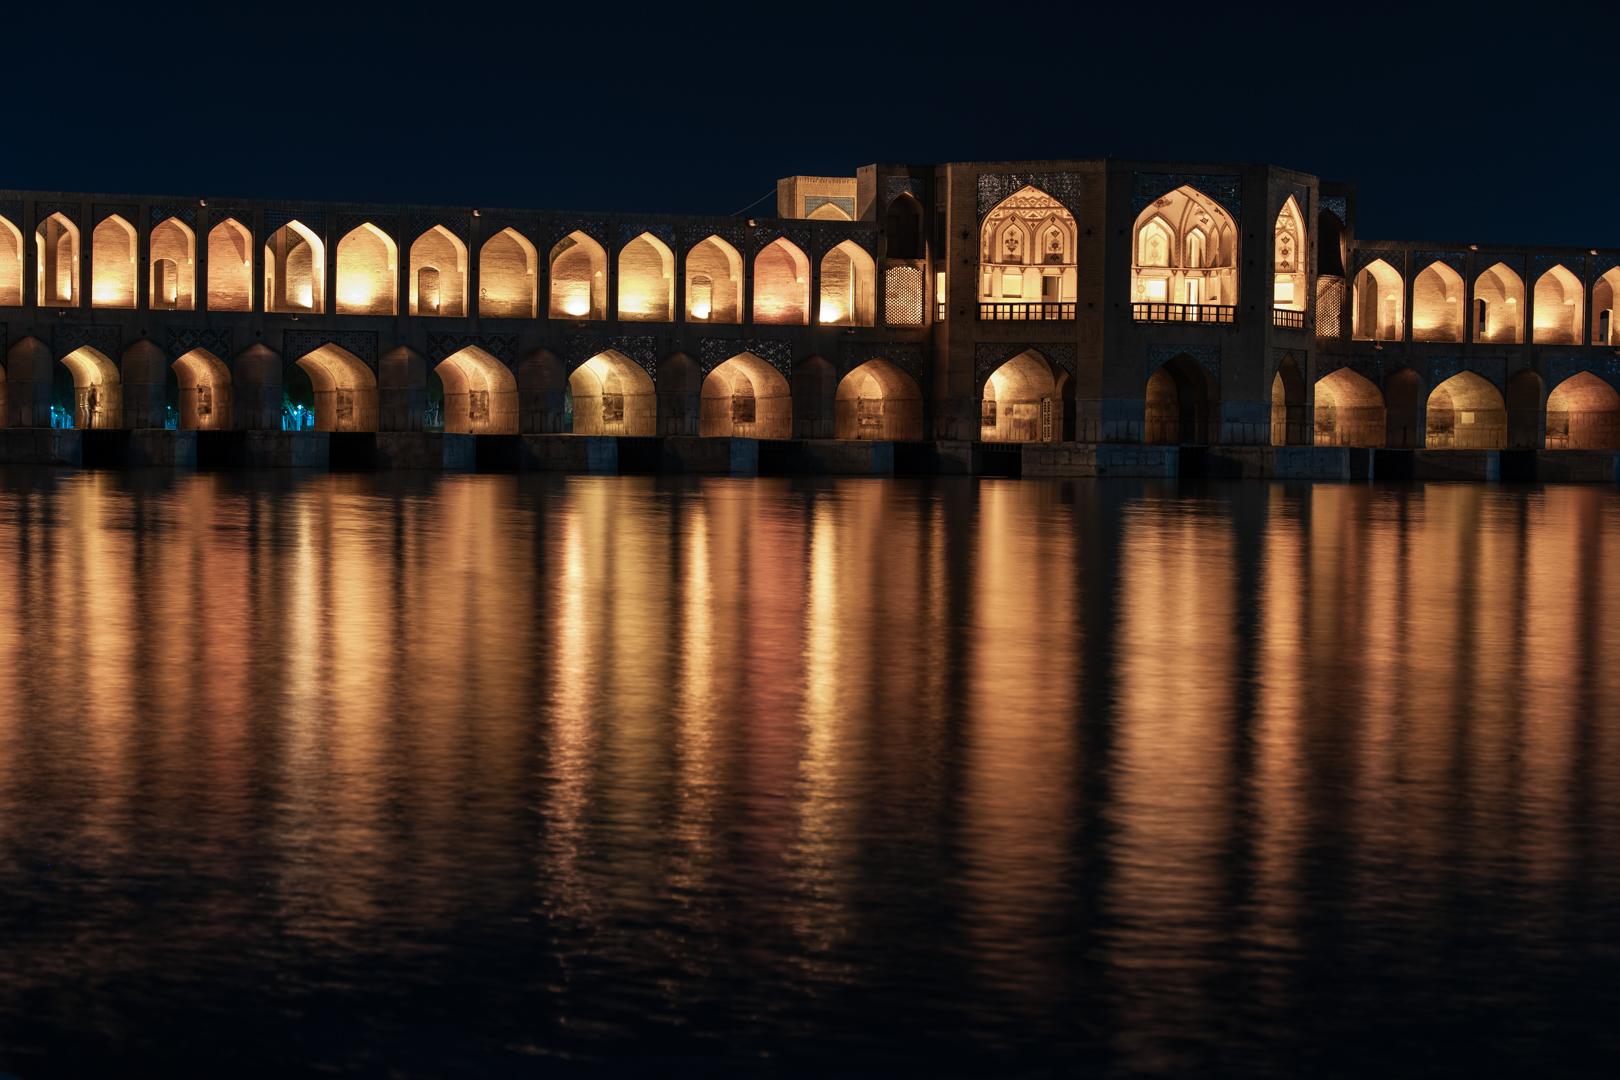 The Khaju bridge by night